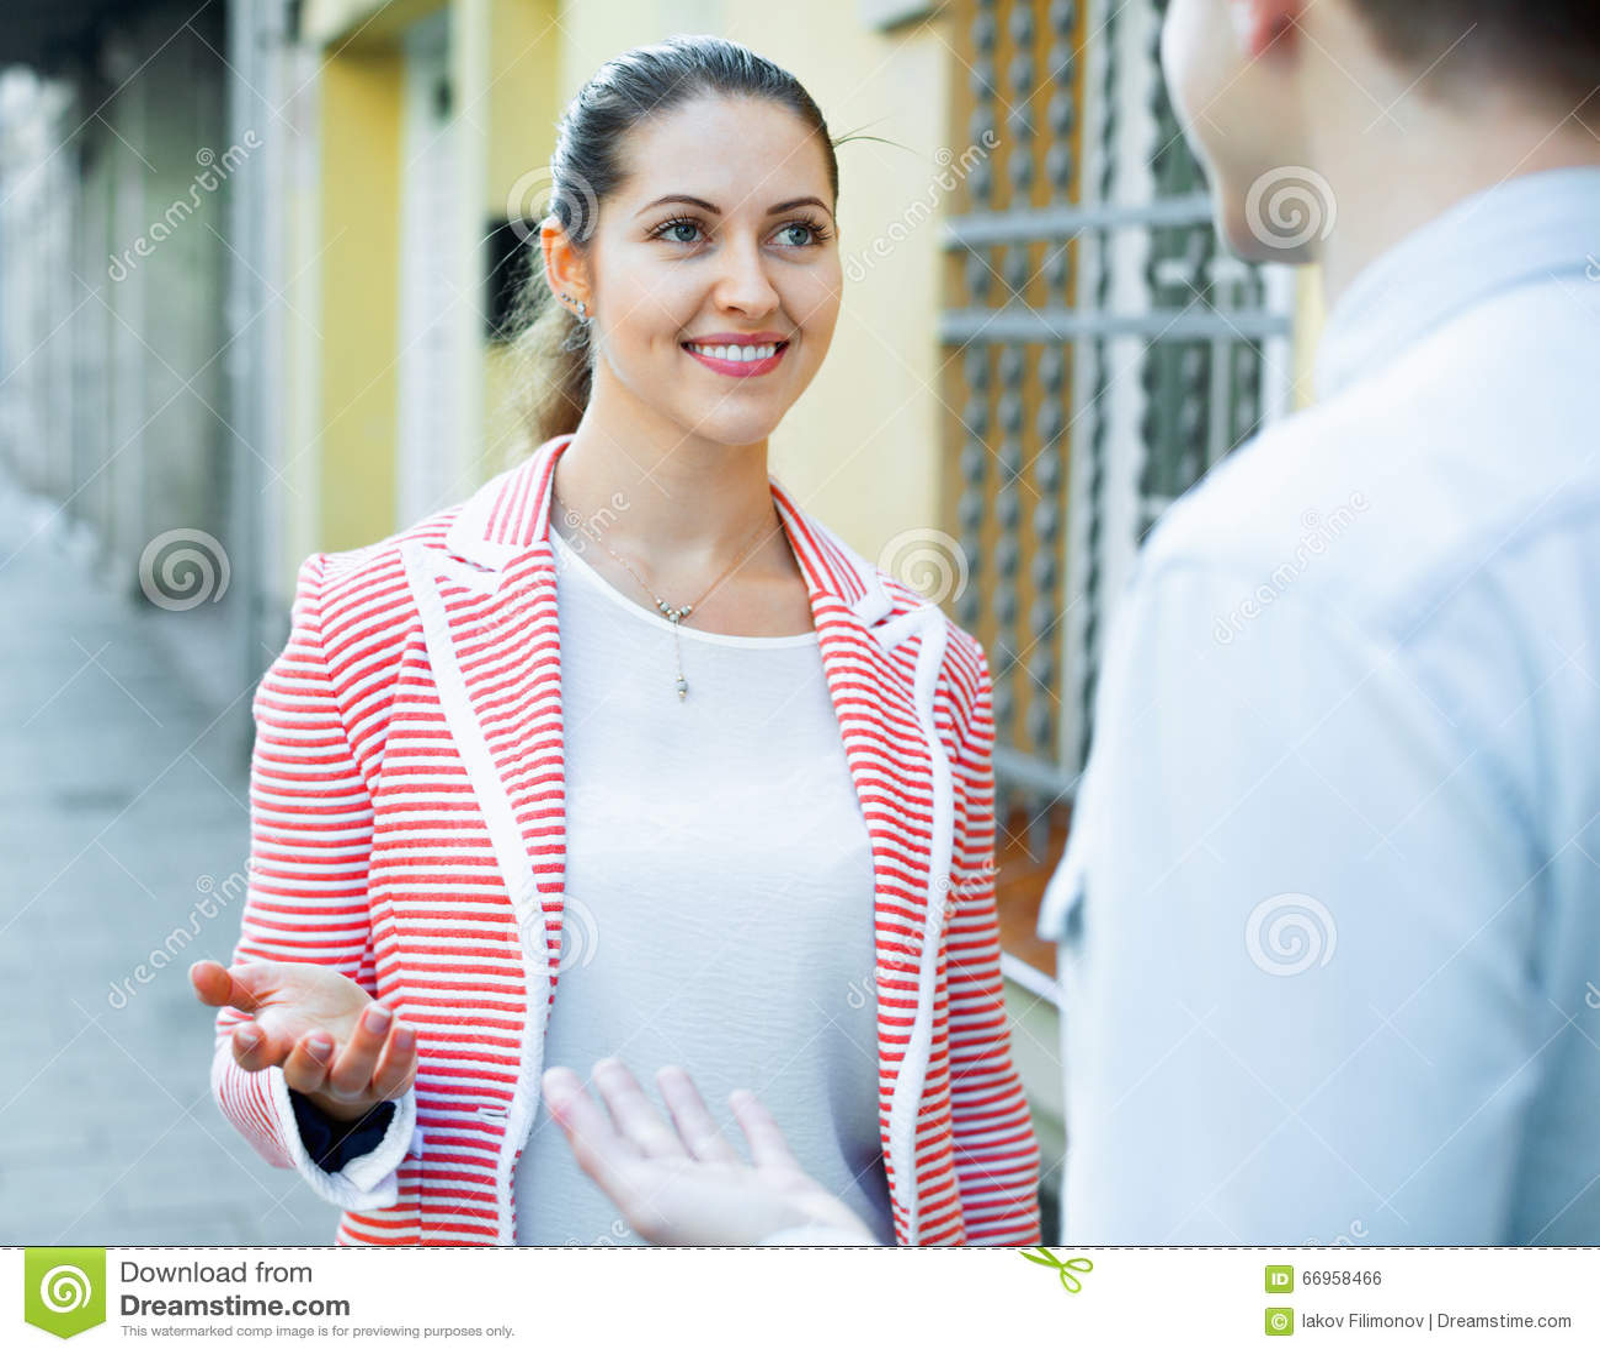 remarkable, very useful easy flirting tips for guys something also